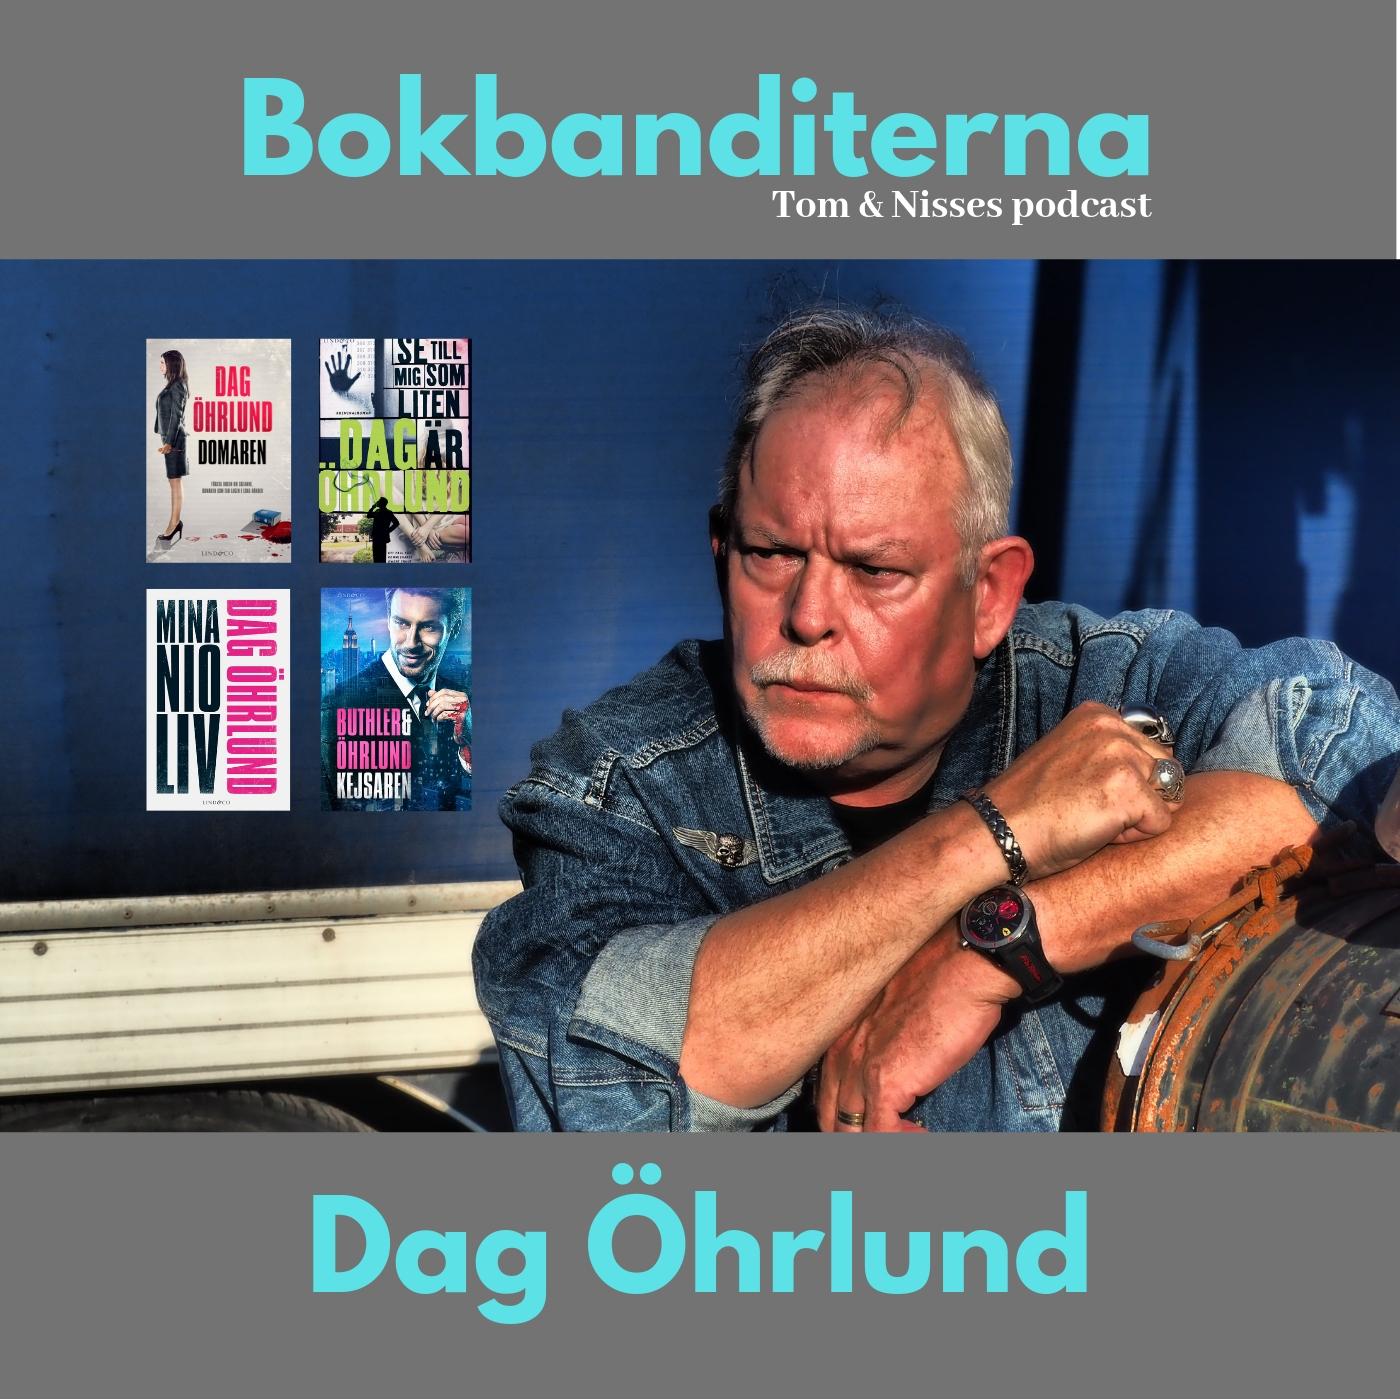 Intervju med Dag Öhrlund